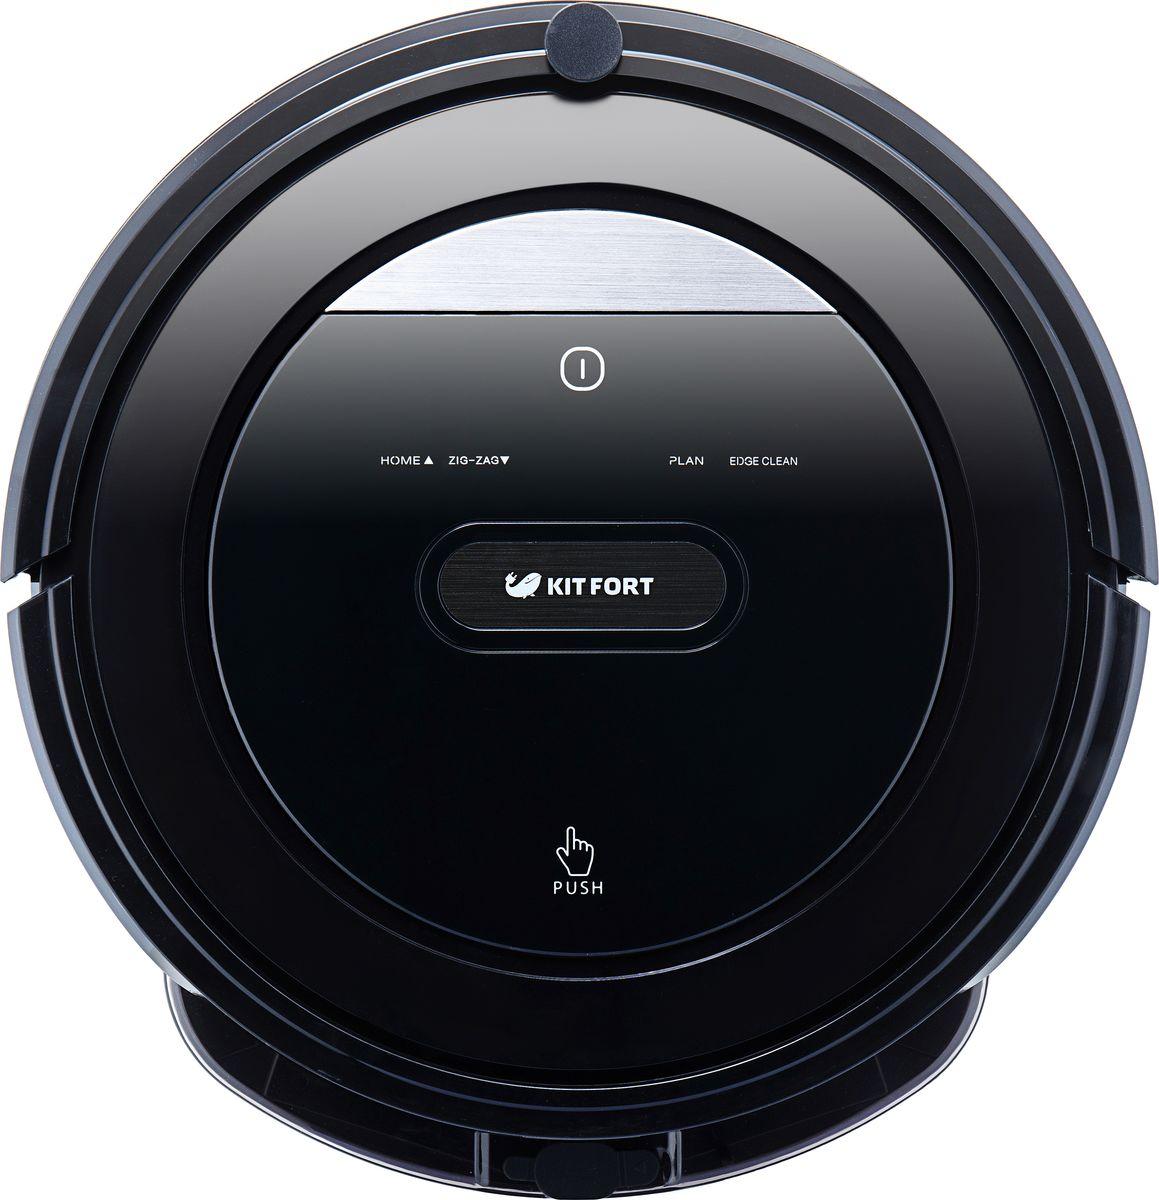 Kitfort KT-516, Black робот-пылесос - Пылесосы